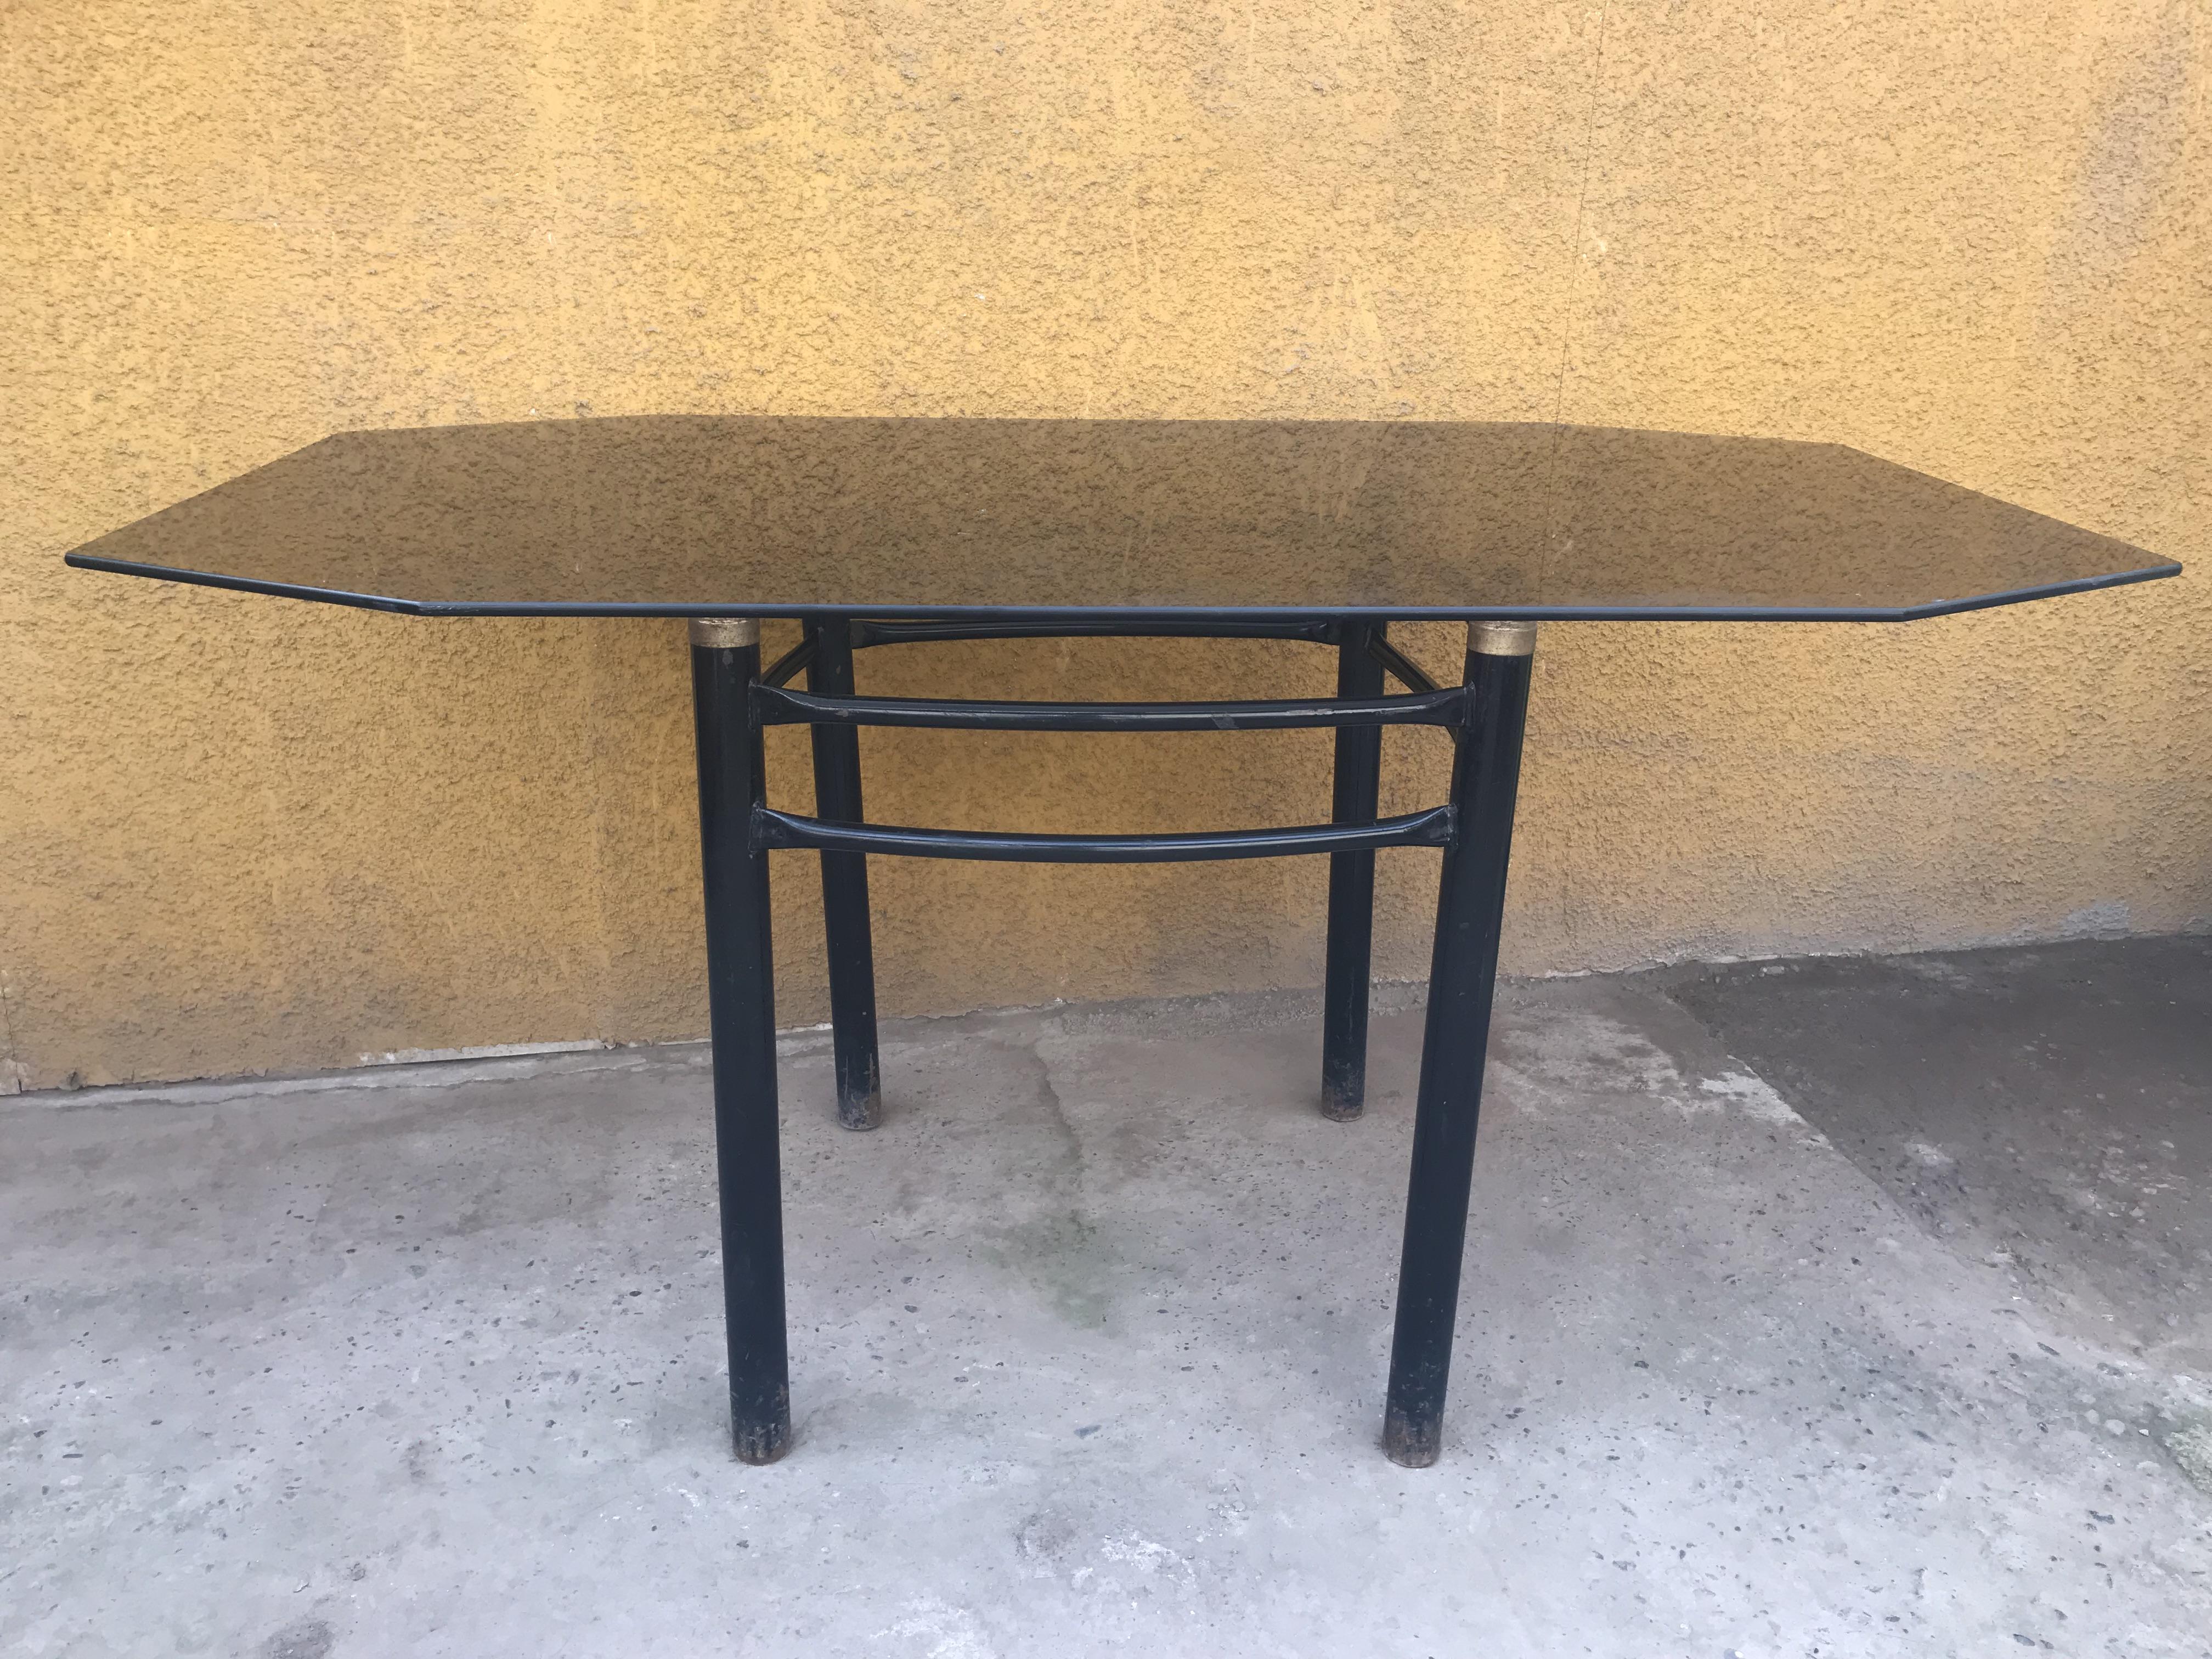 OFERTA / Mesa Comedor Vidrio elegante + 4 sillas | TodoMercado Chile